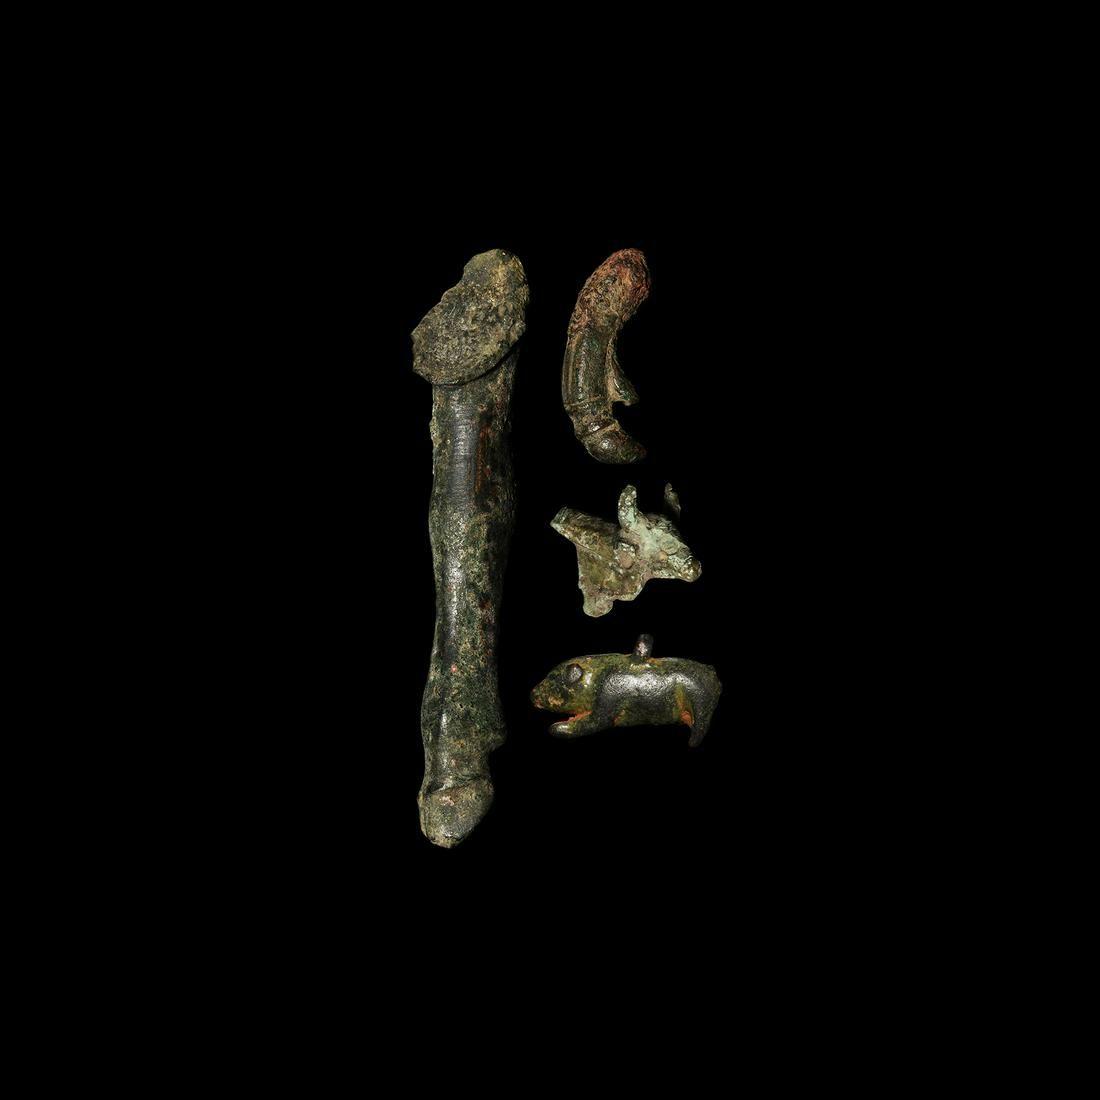 Roman Animal Artefact Collection